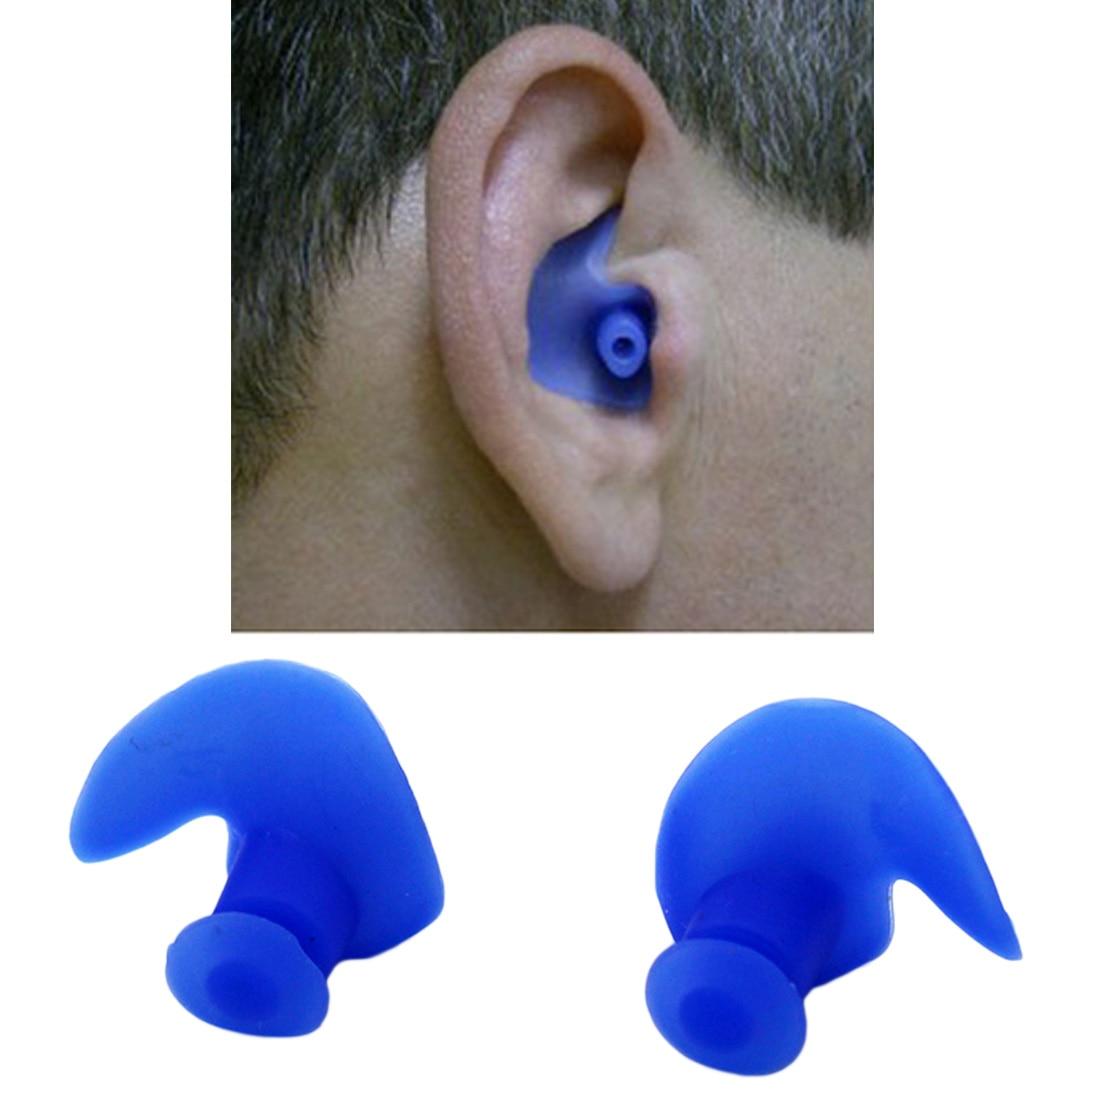 zwembad Swimming Earplugs Professional Silicone Swim Earplugs Adult Swimmers Children Diving Soft Anti-Noise Ear Plug